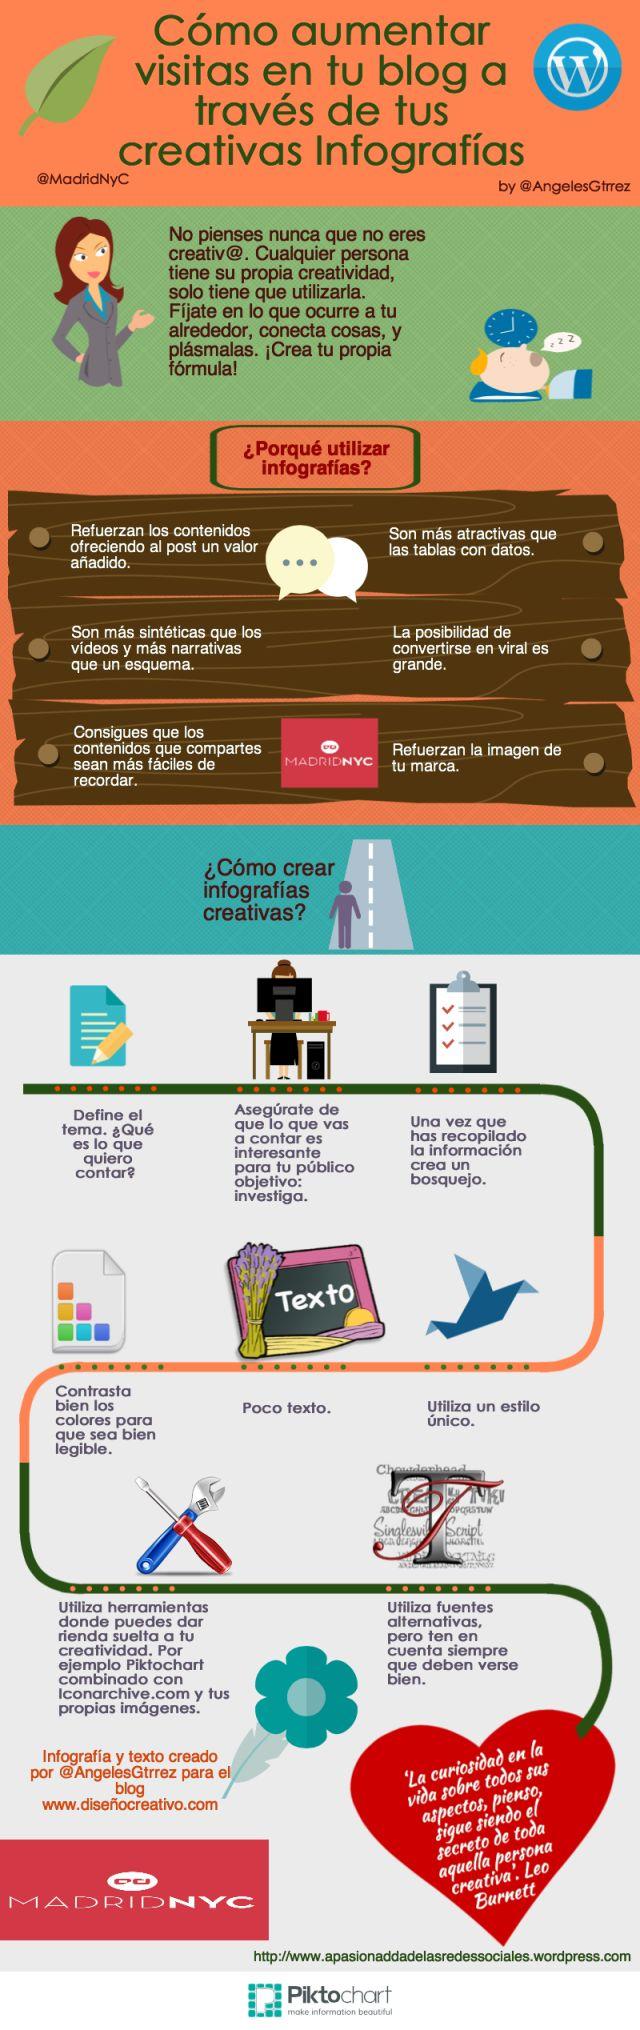 Cómo aumentar visitas en tu blog a través de creativas Infografías #infografia #infographic